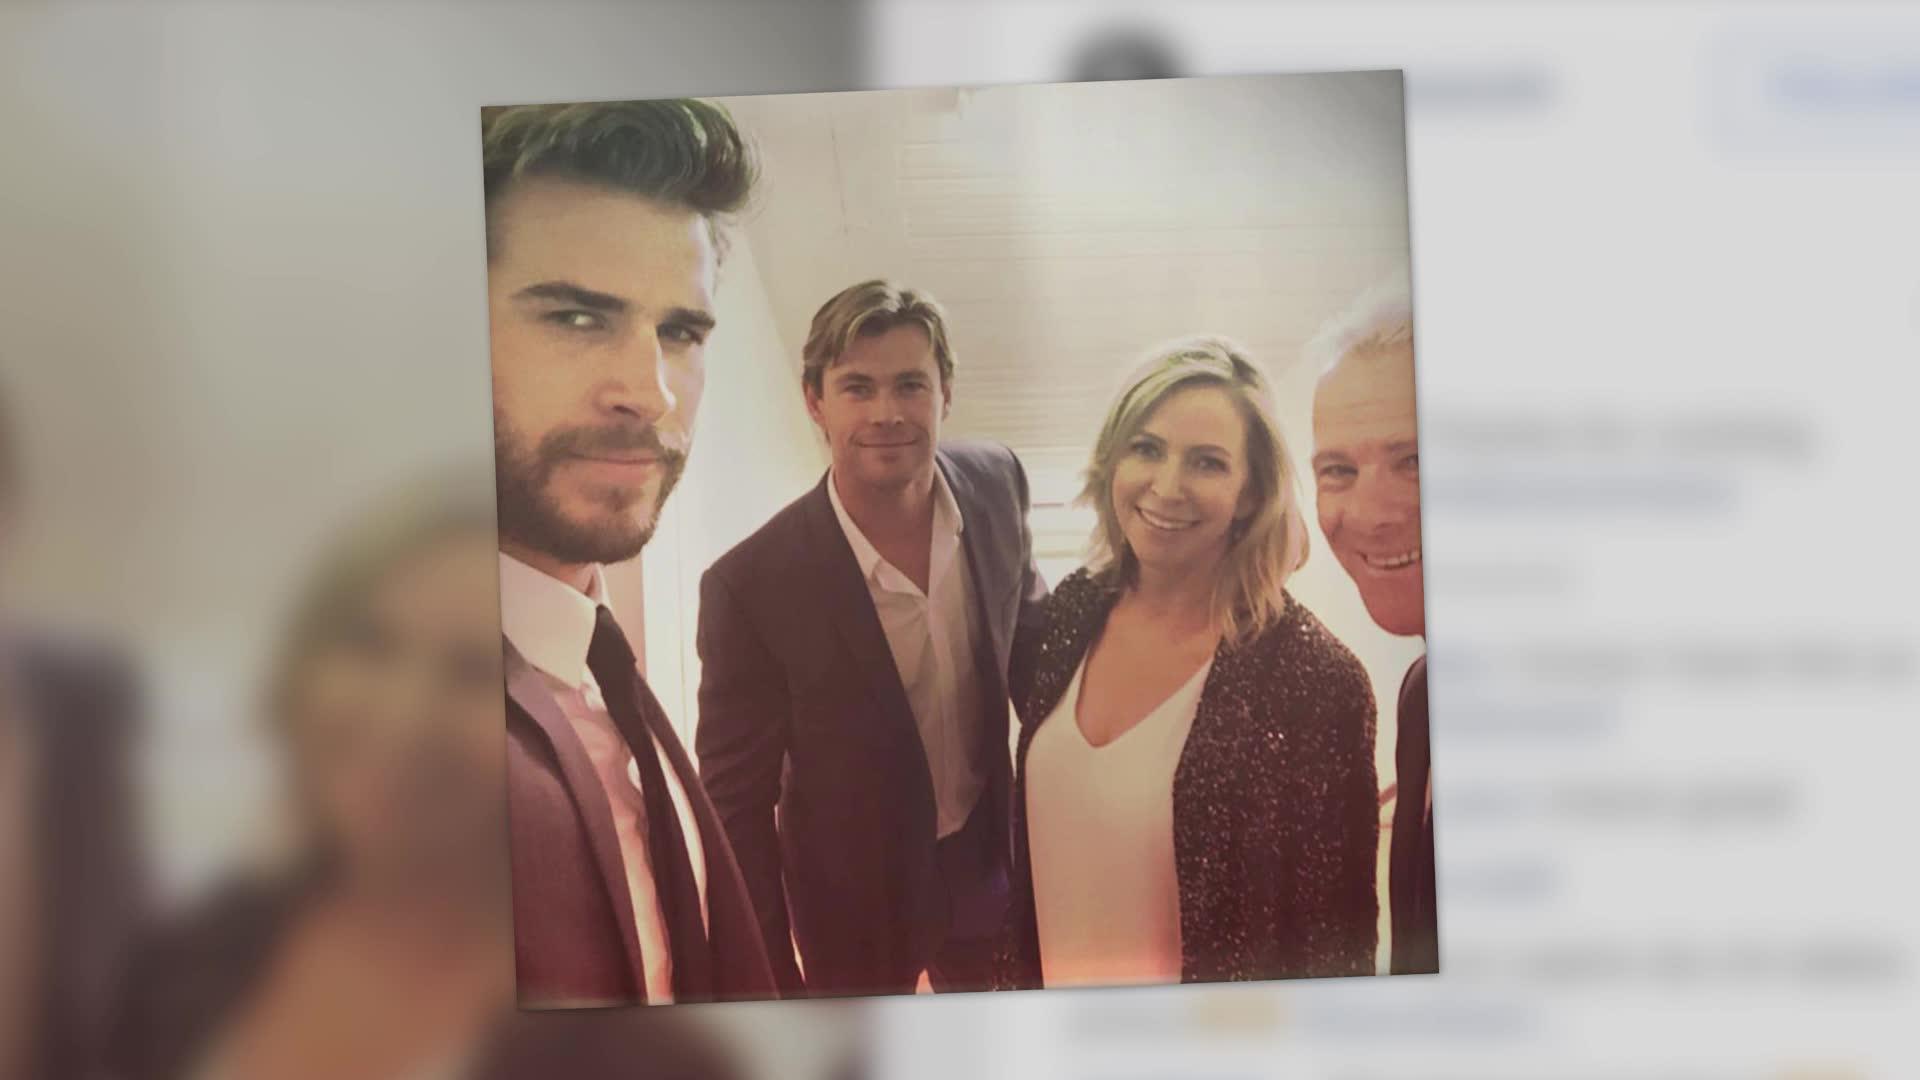 Chris Hemsworth Paid Off His Parent's Debts